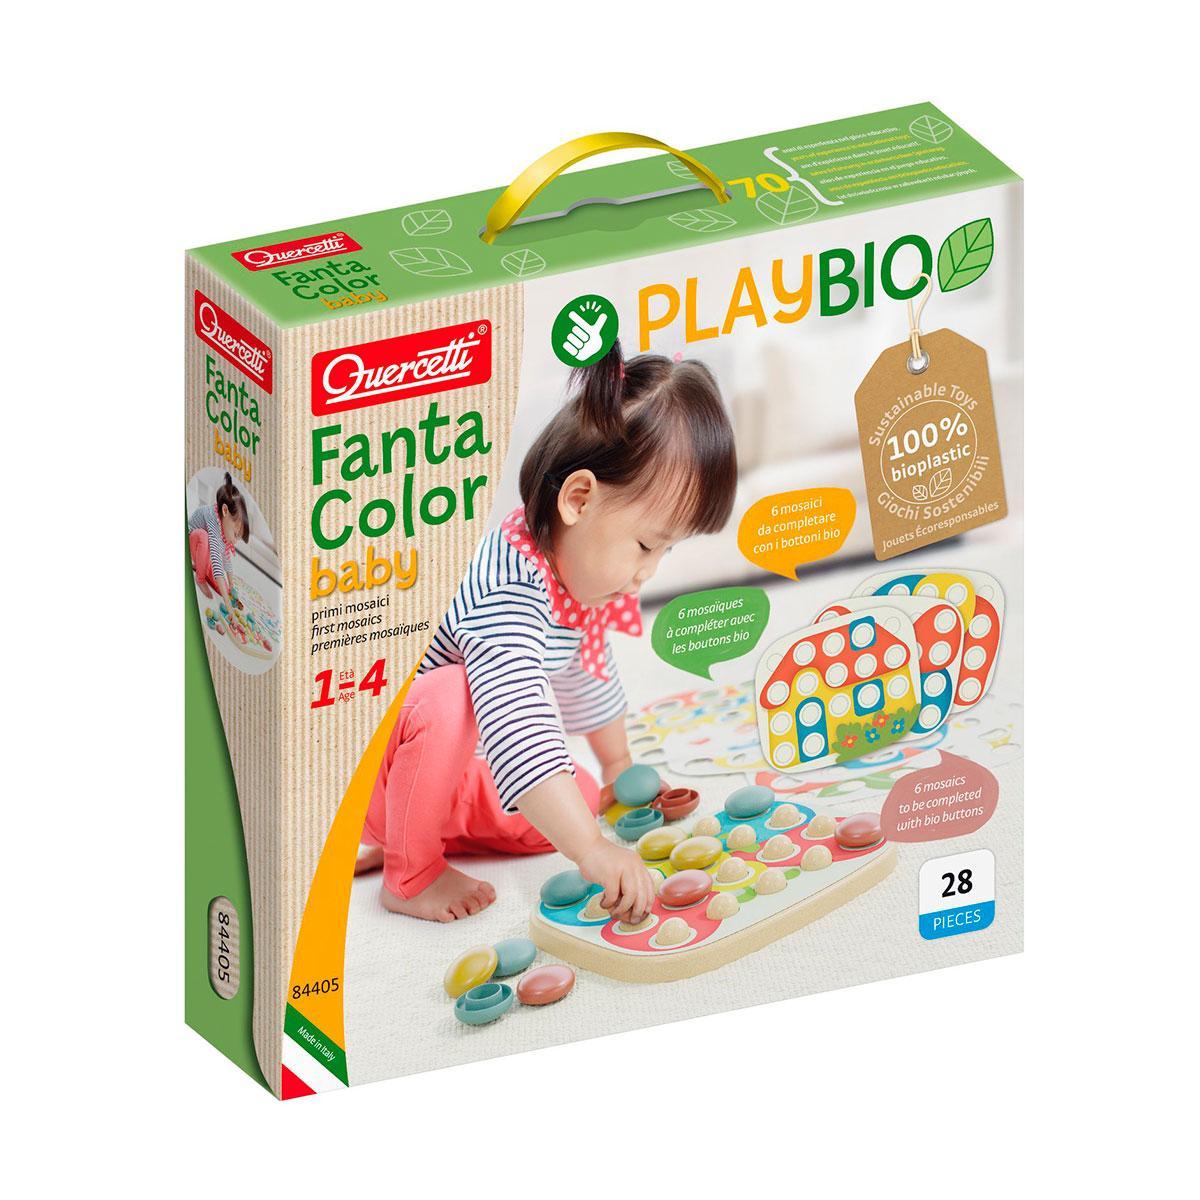 "Набор серии Play Bio- Для занятий мозаикой ""Fantacolor Baby"" Quercetti 84405-Q"